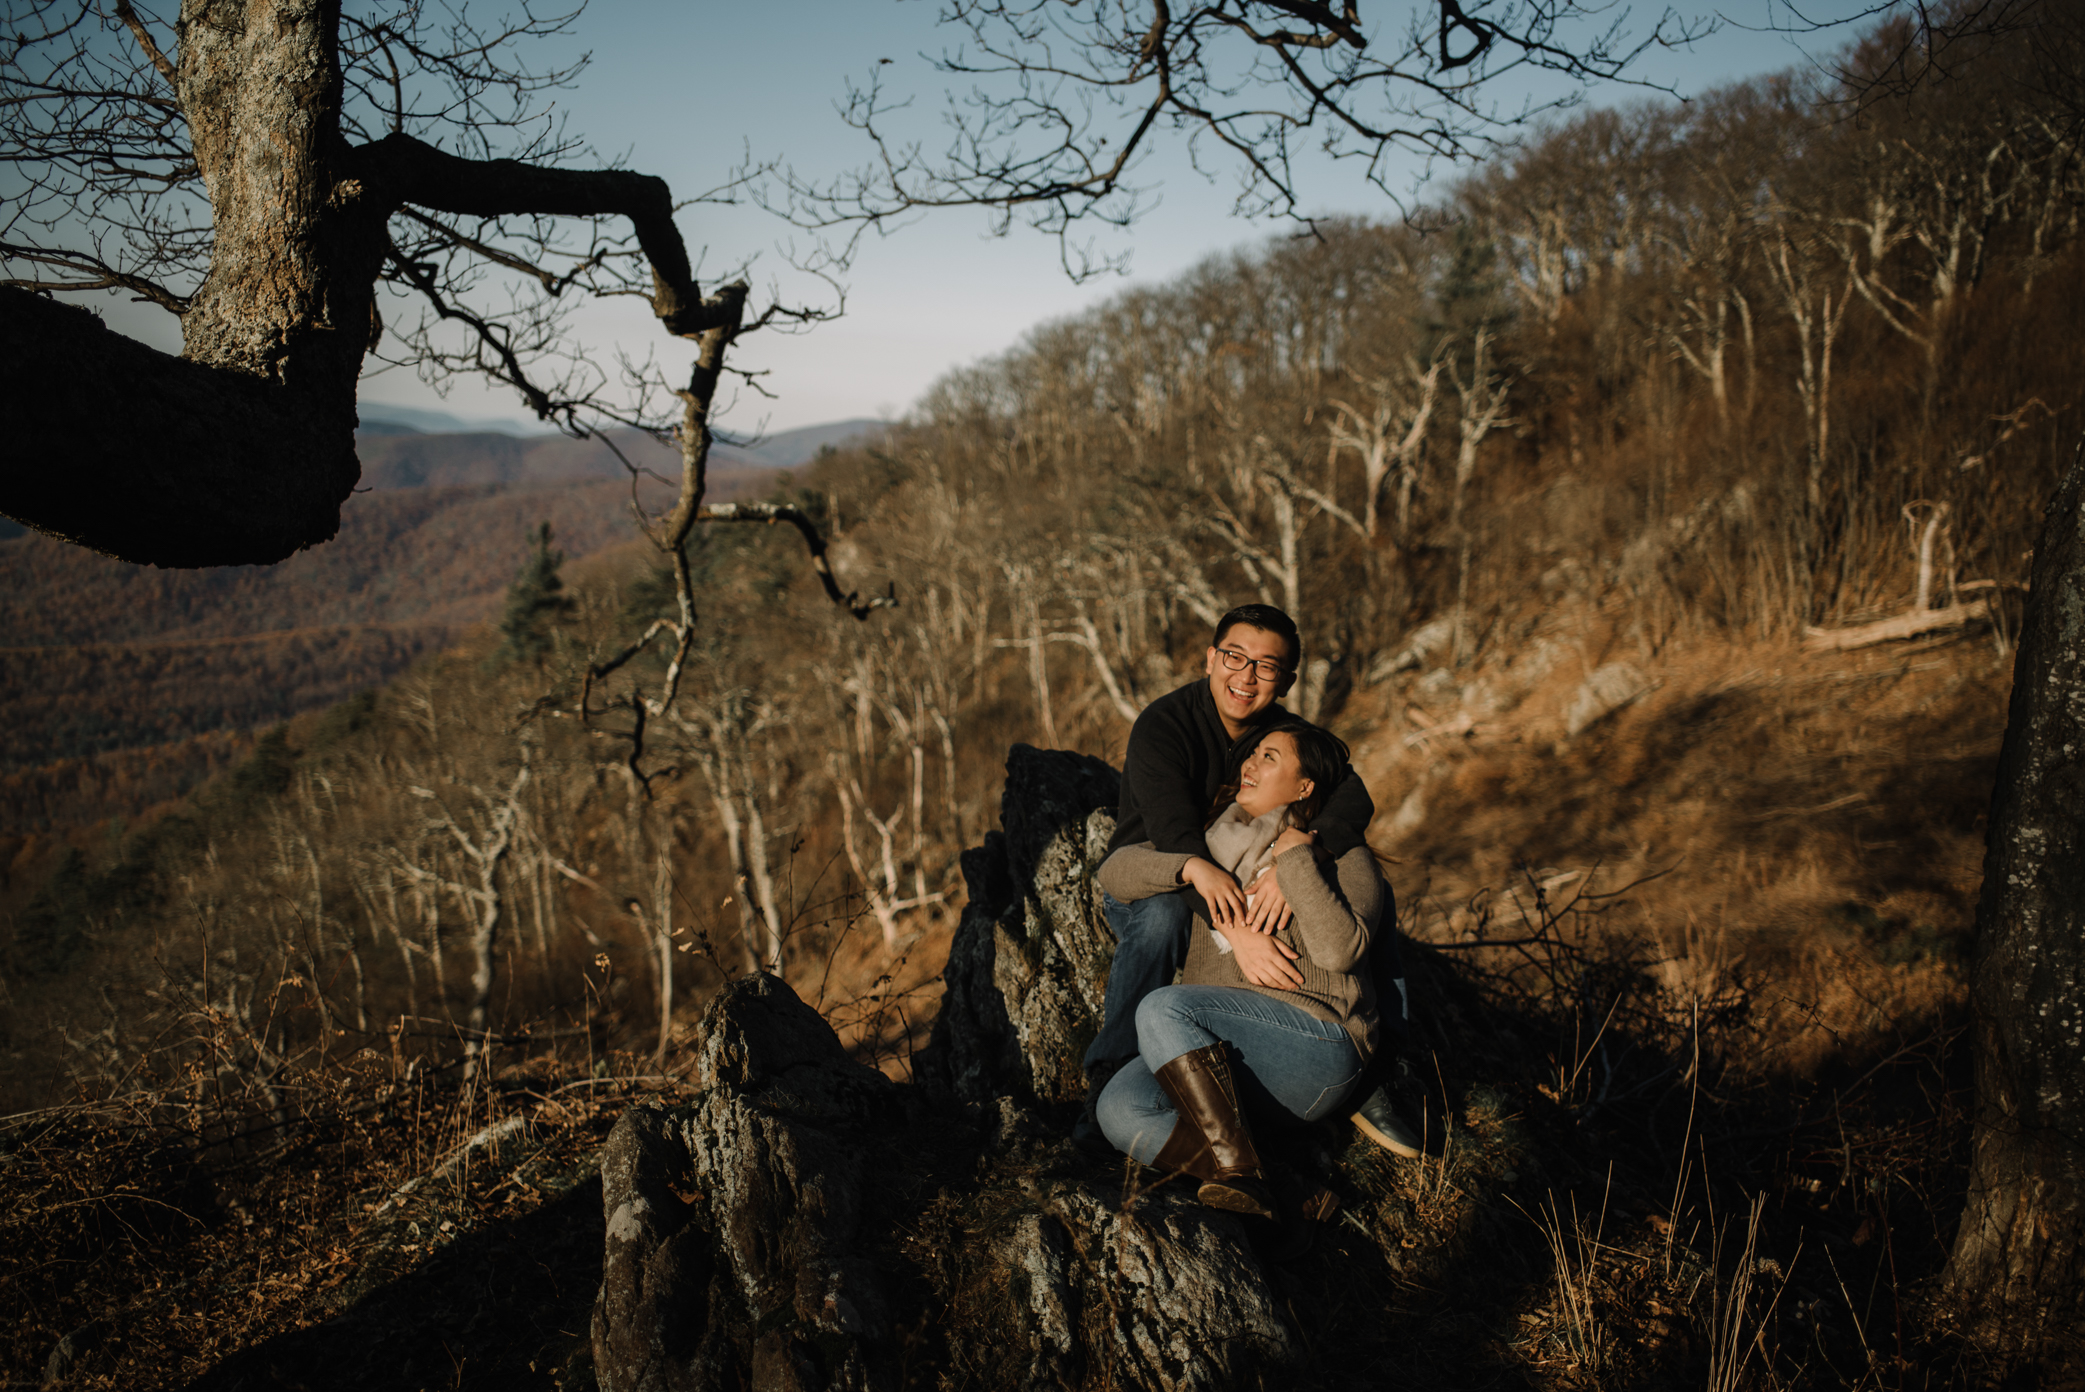 Joshua and Kristina - Shenandoah National Park - Skyline Drive - Winter Engagement Session Photographer - White Sails Creative_2.JPG